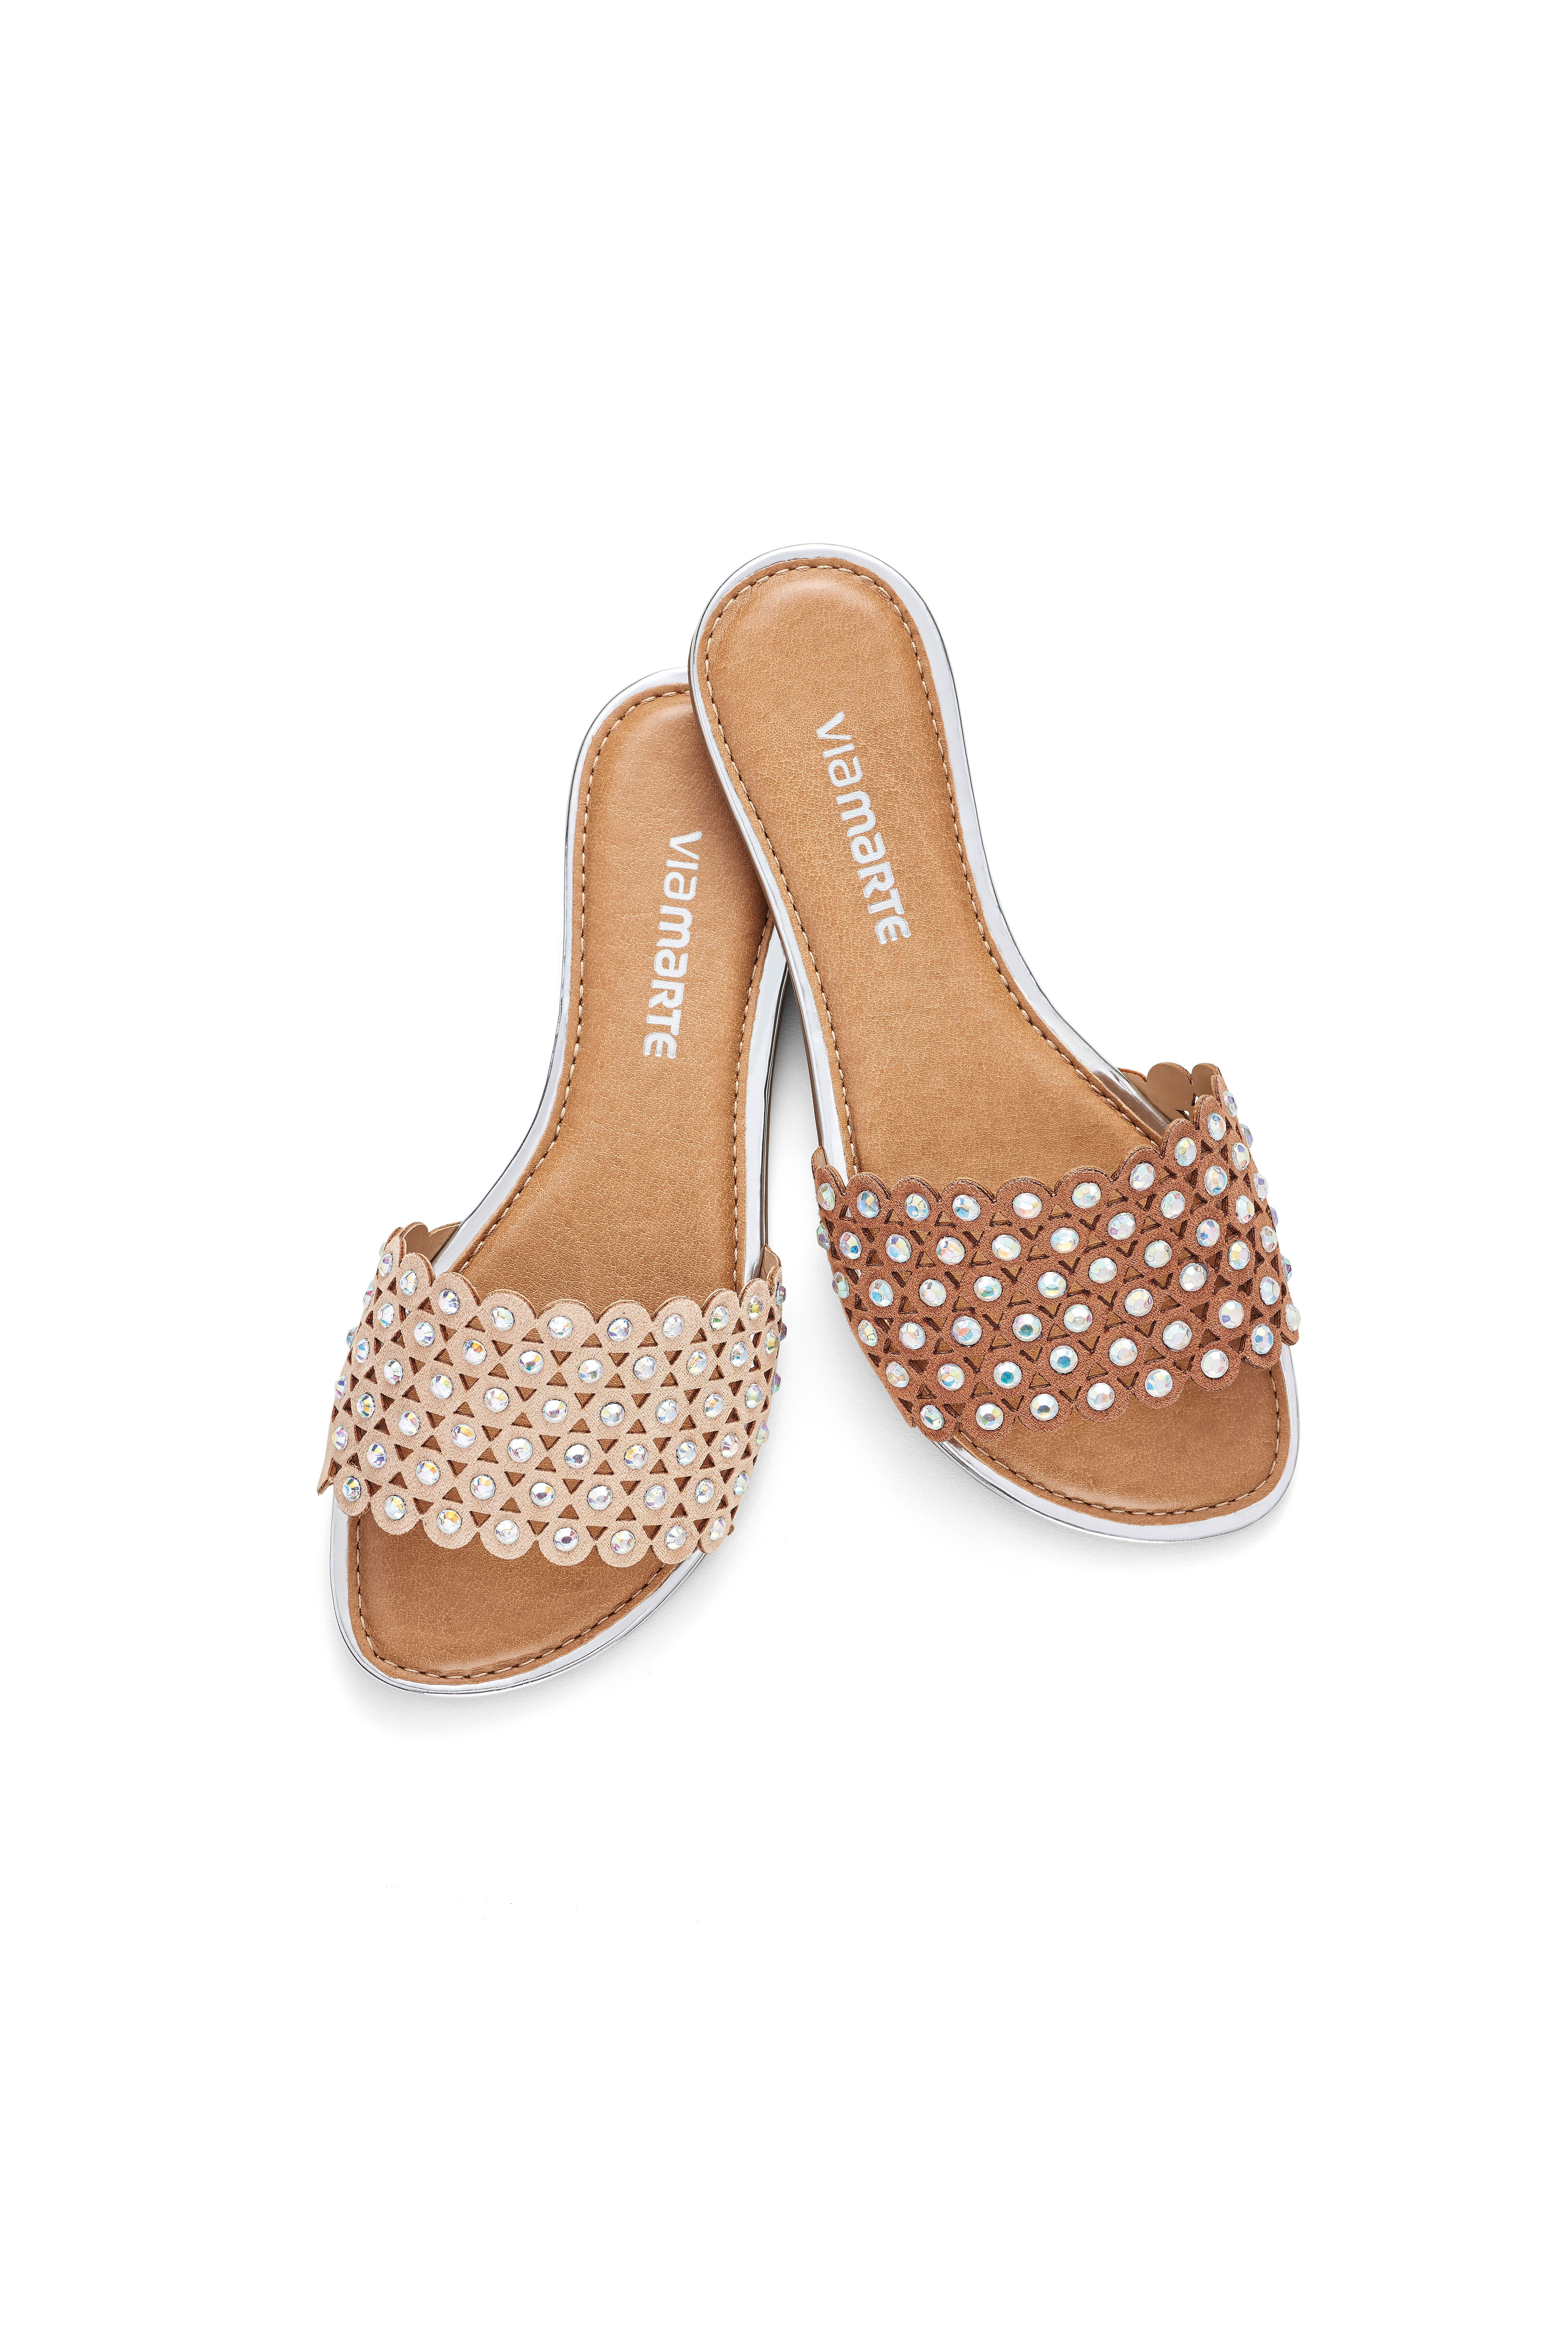 8f97eb2e3 Rasteira - Flat - Detalhes - Tendência - Ref. 16-18702 | sandals n ...